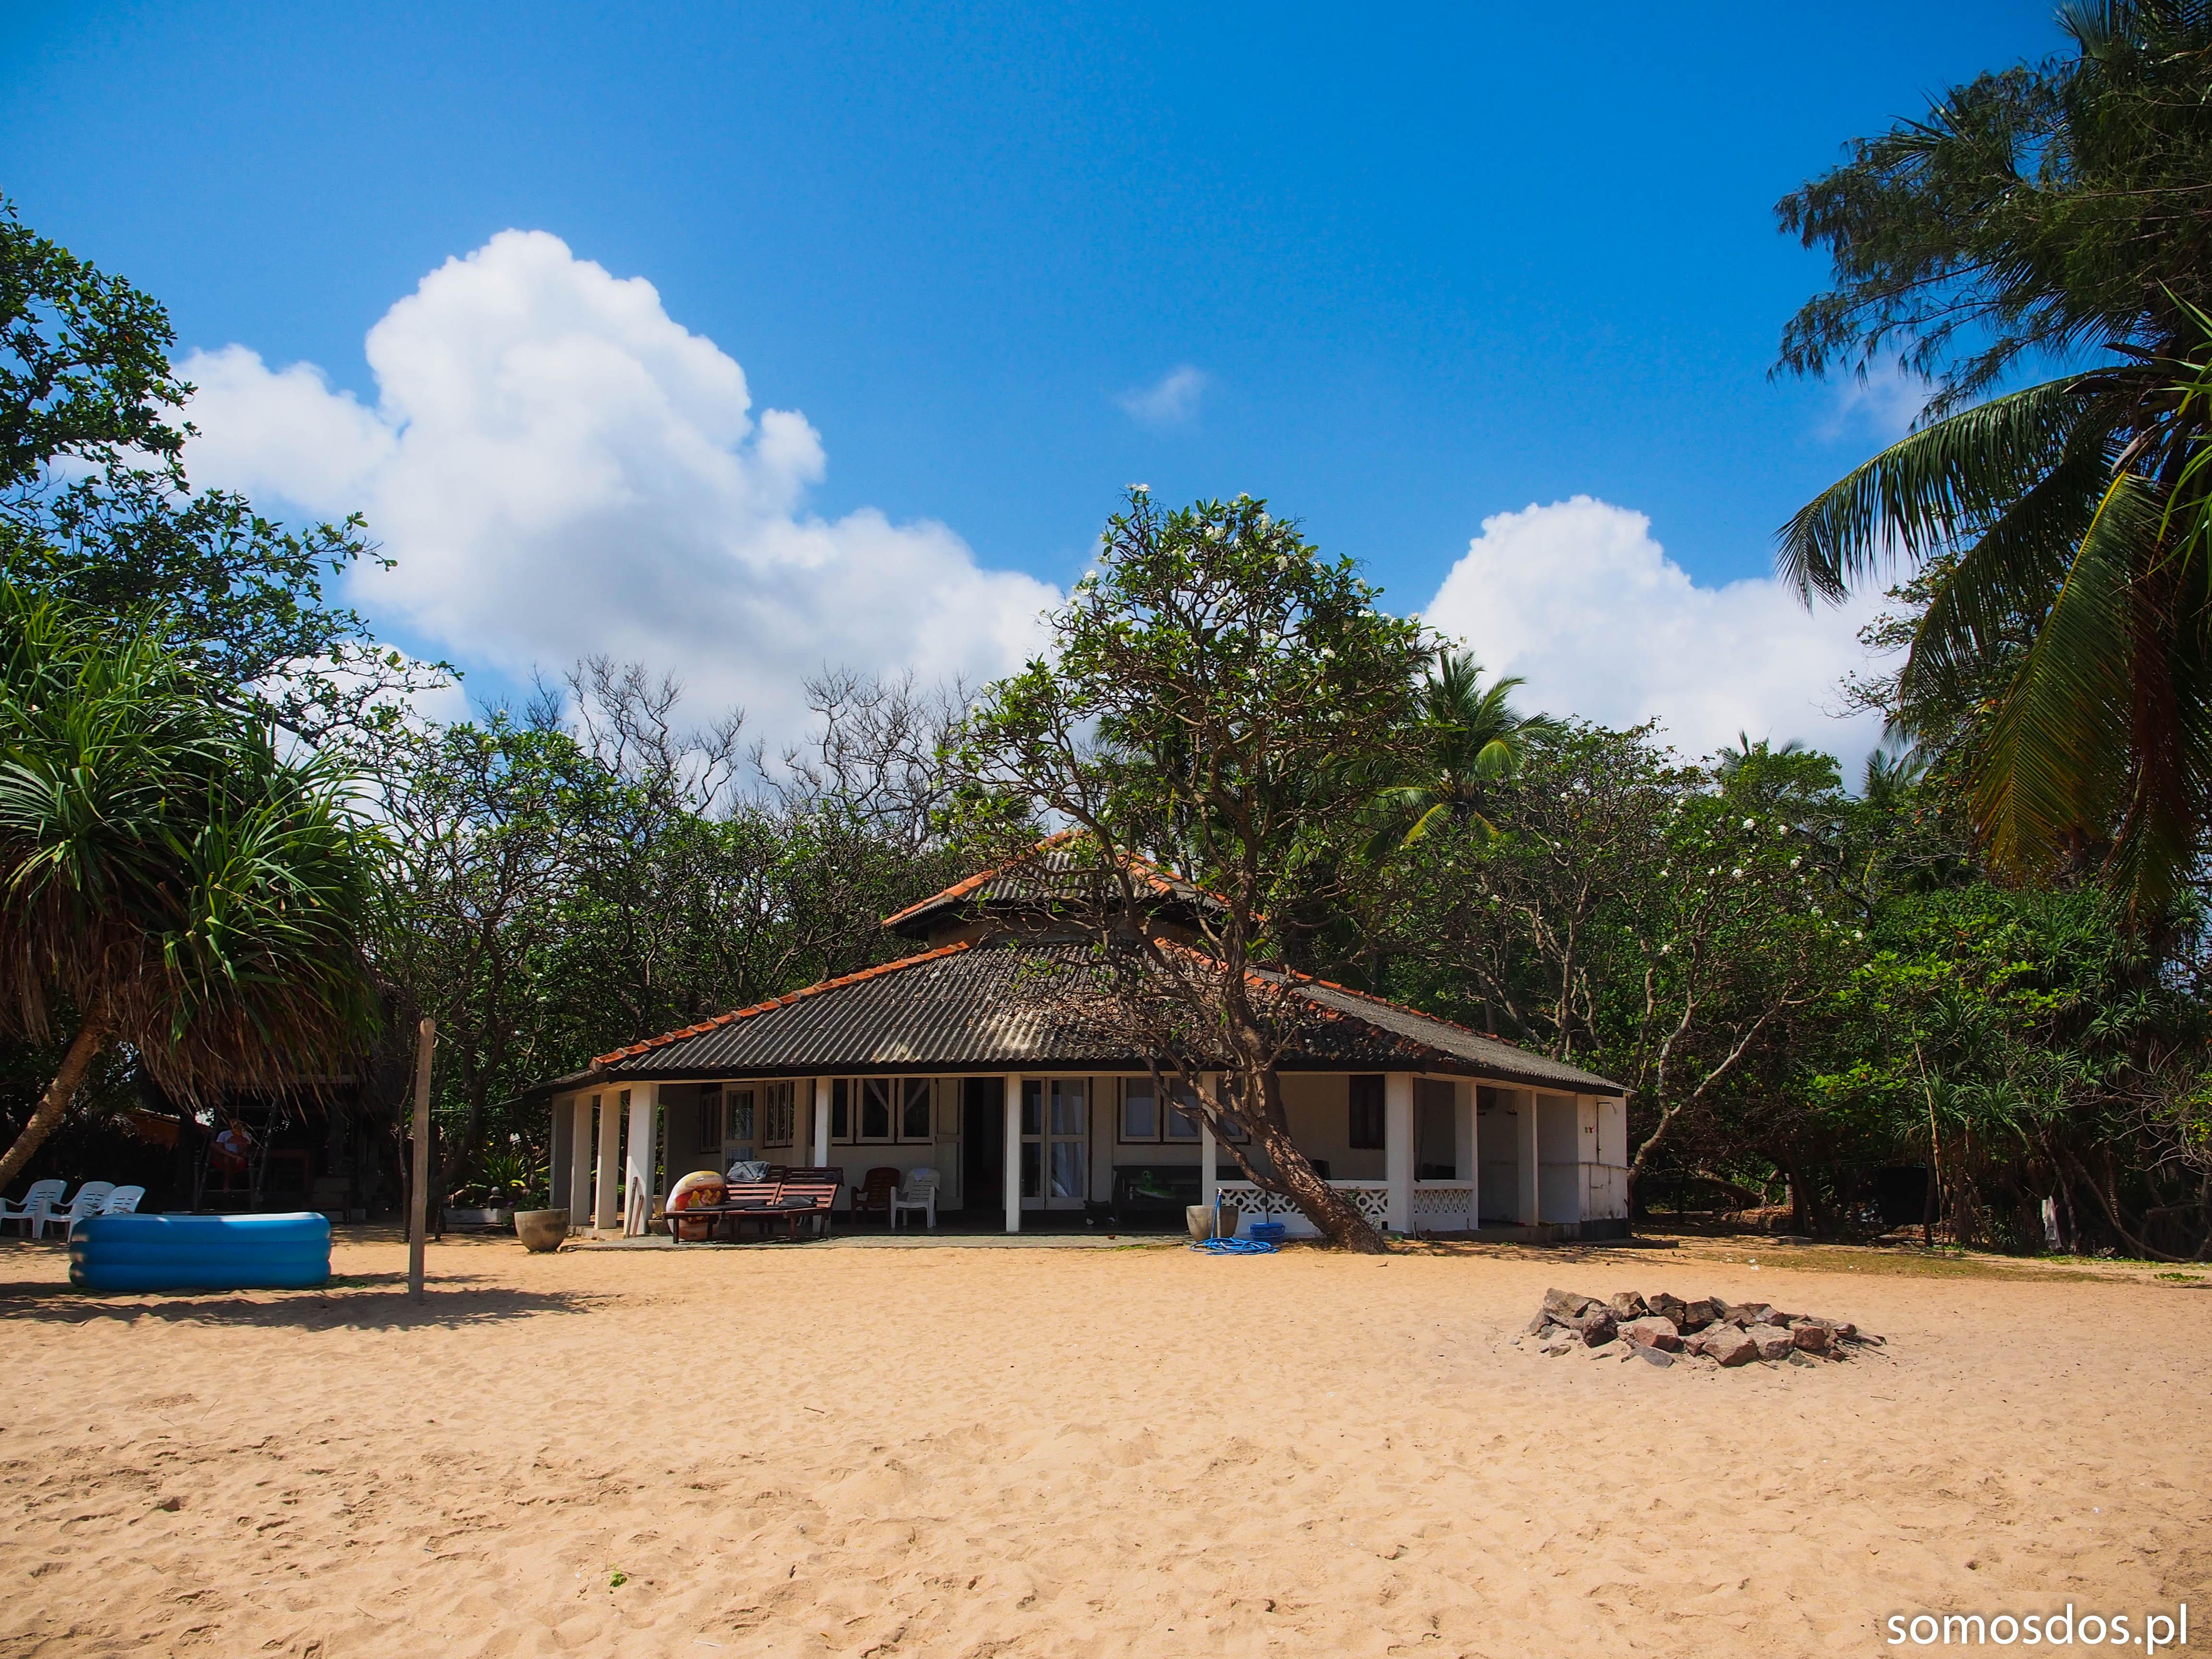 Moon Isle Beach Bungalow